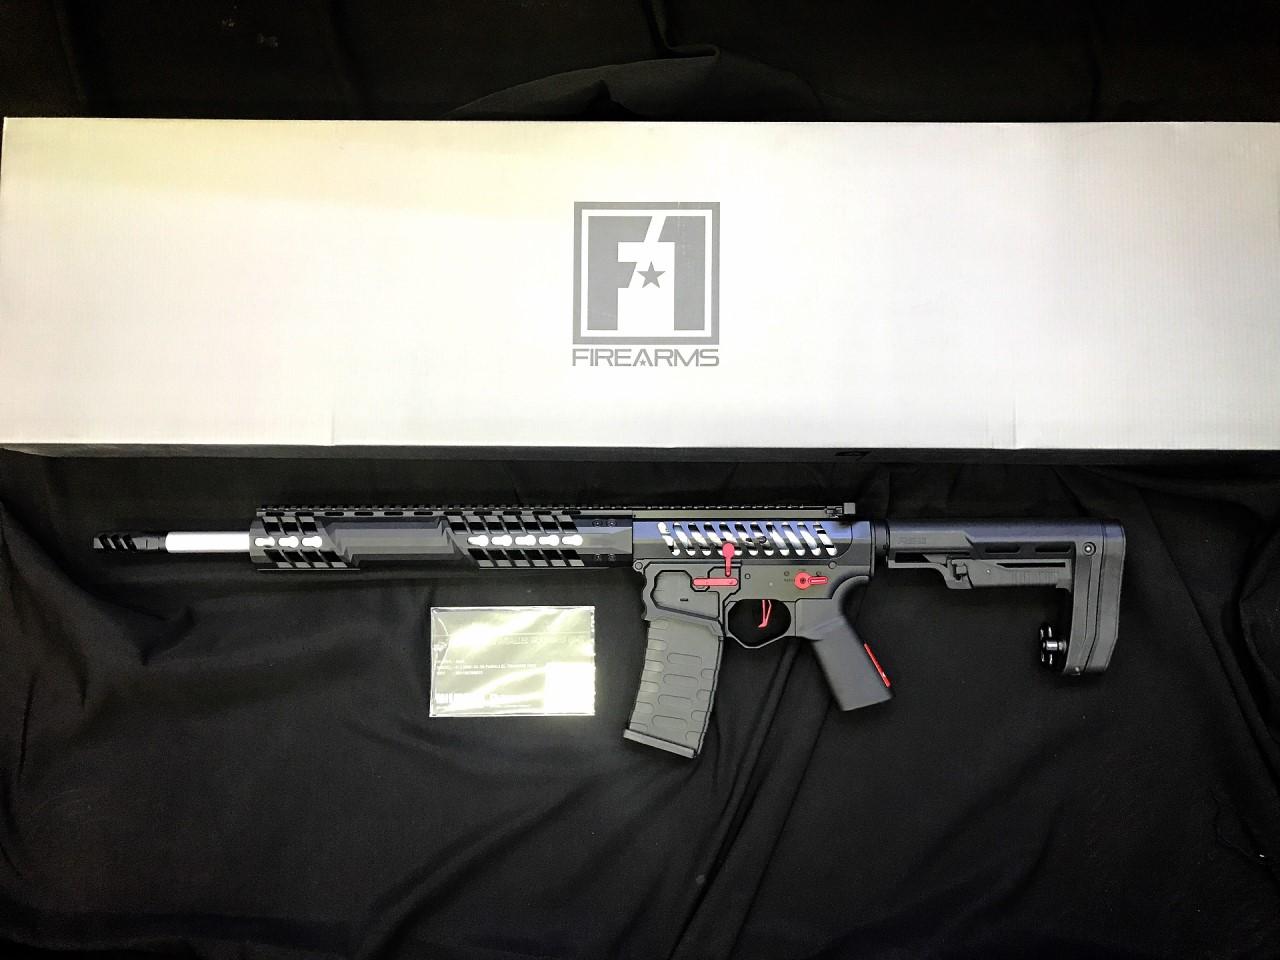 EMG F1 FIREARMS BDR-15 AR15, Unique Replica Skeletonised